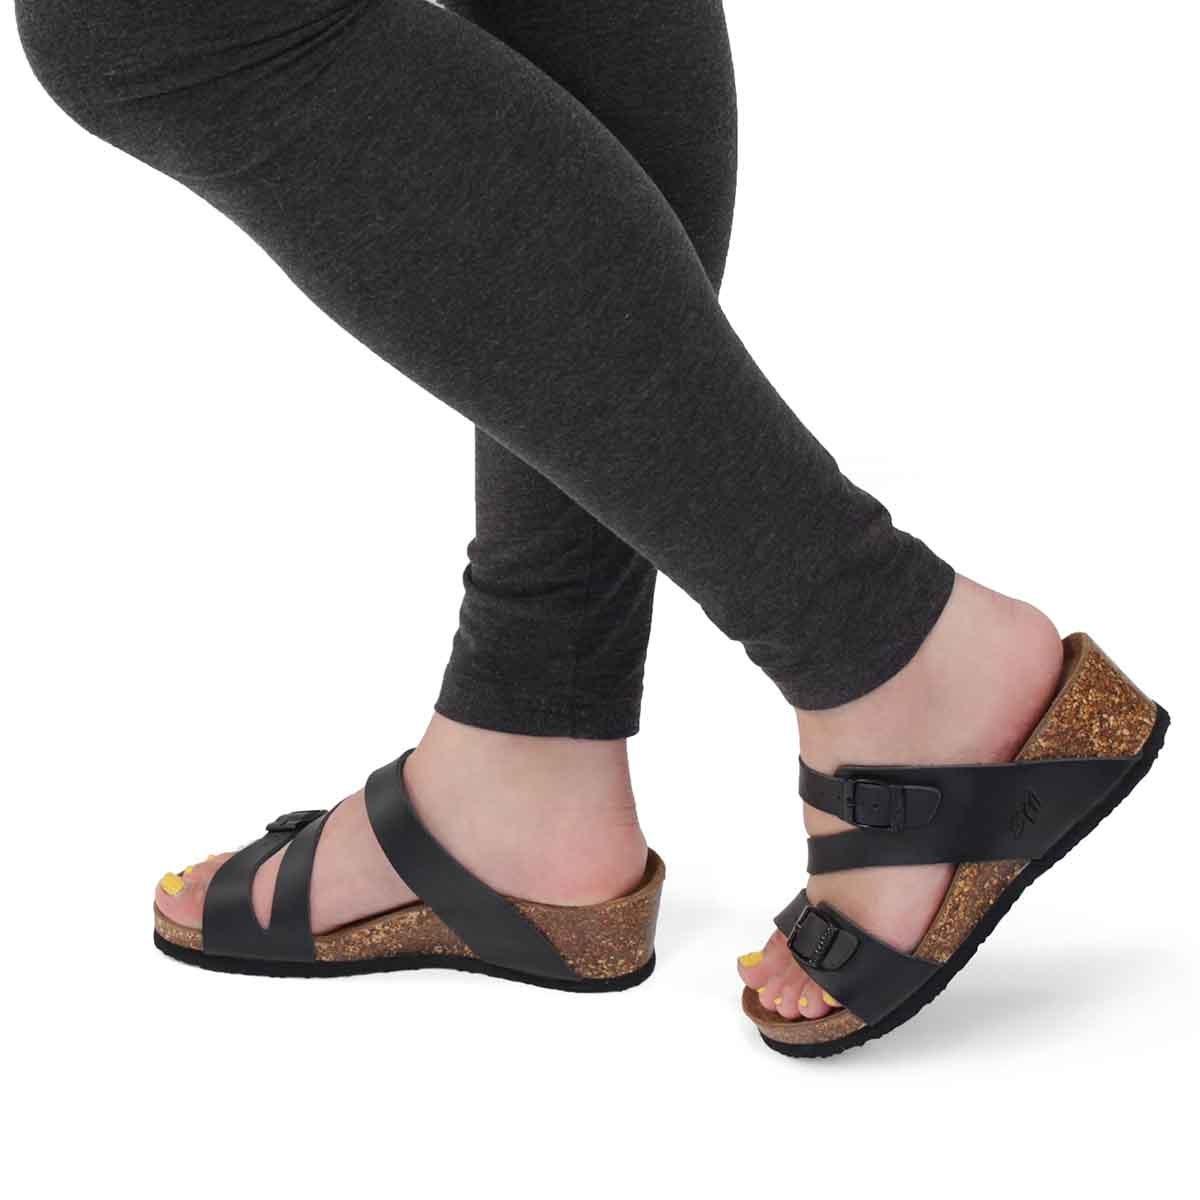 Lds Althea 5 blk memory foam wdg sandal